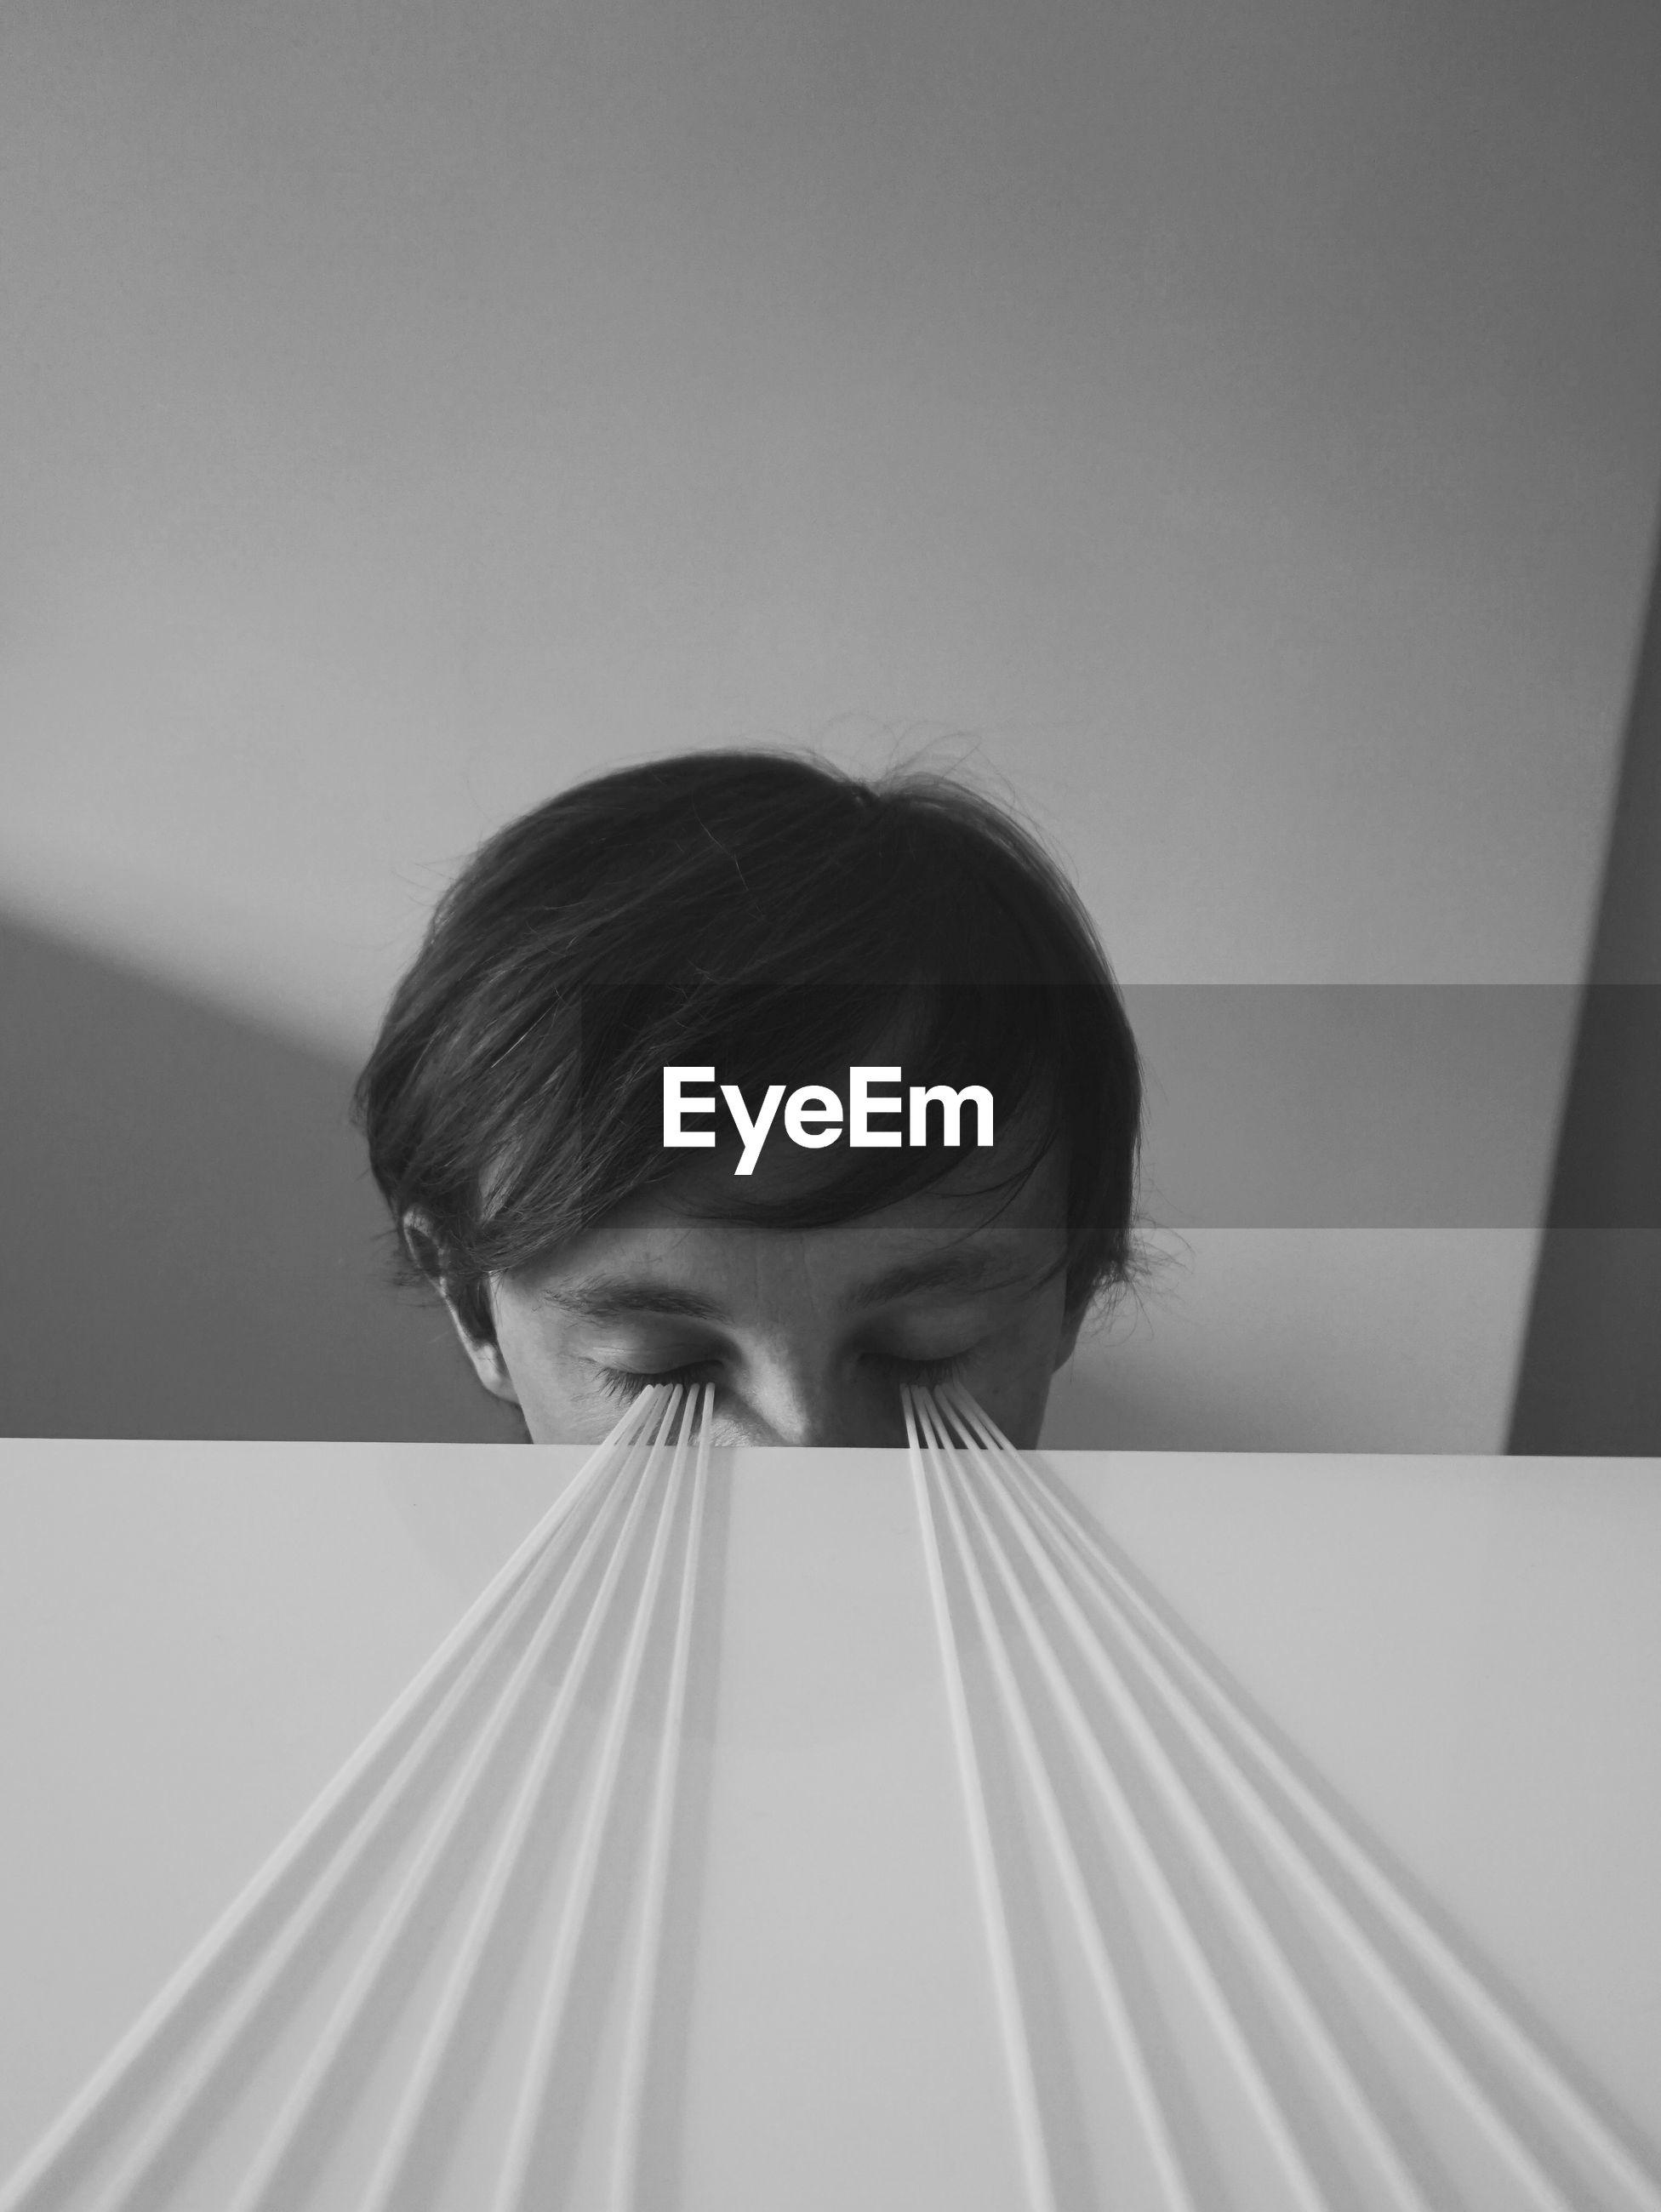 Spaghetti on table leading towards man closed eyes